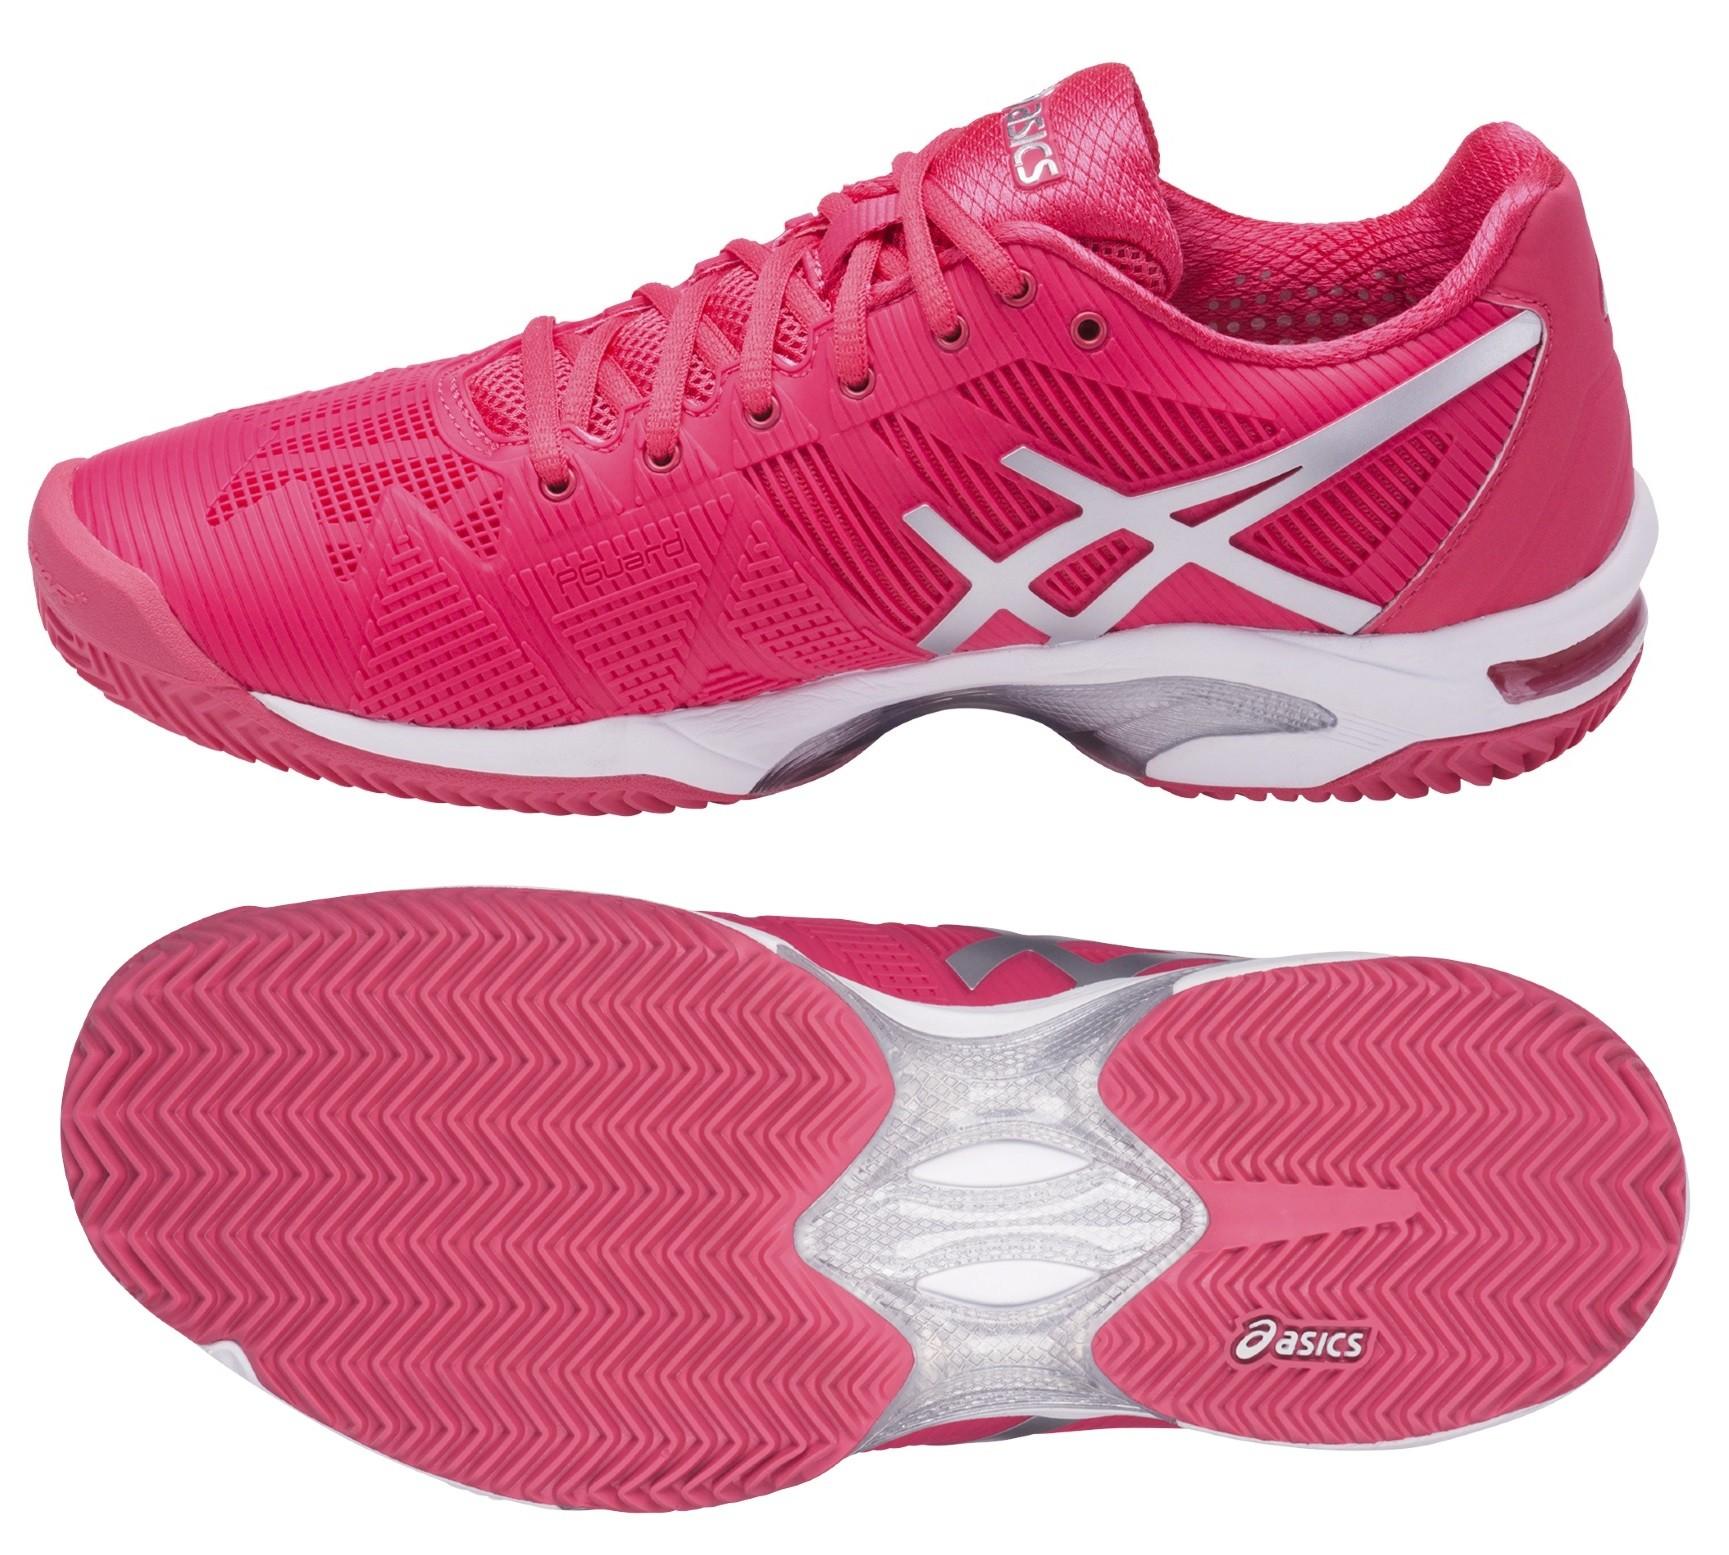 10ac79134503 Dámská tenisová obuv Asics Gel Solution Speed 3 Clay E651N-1993 růžová